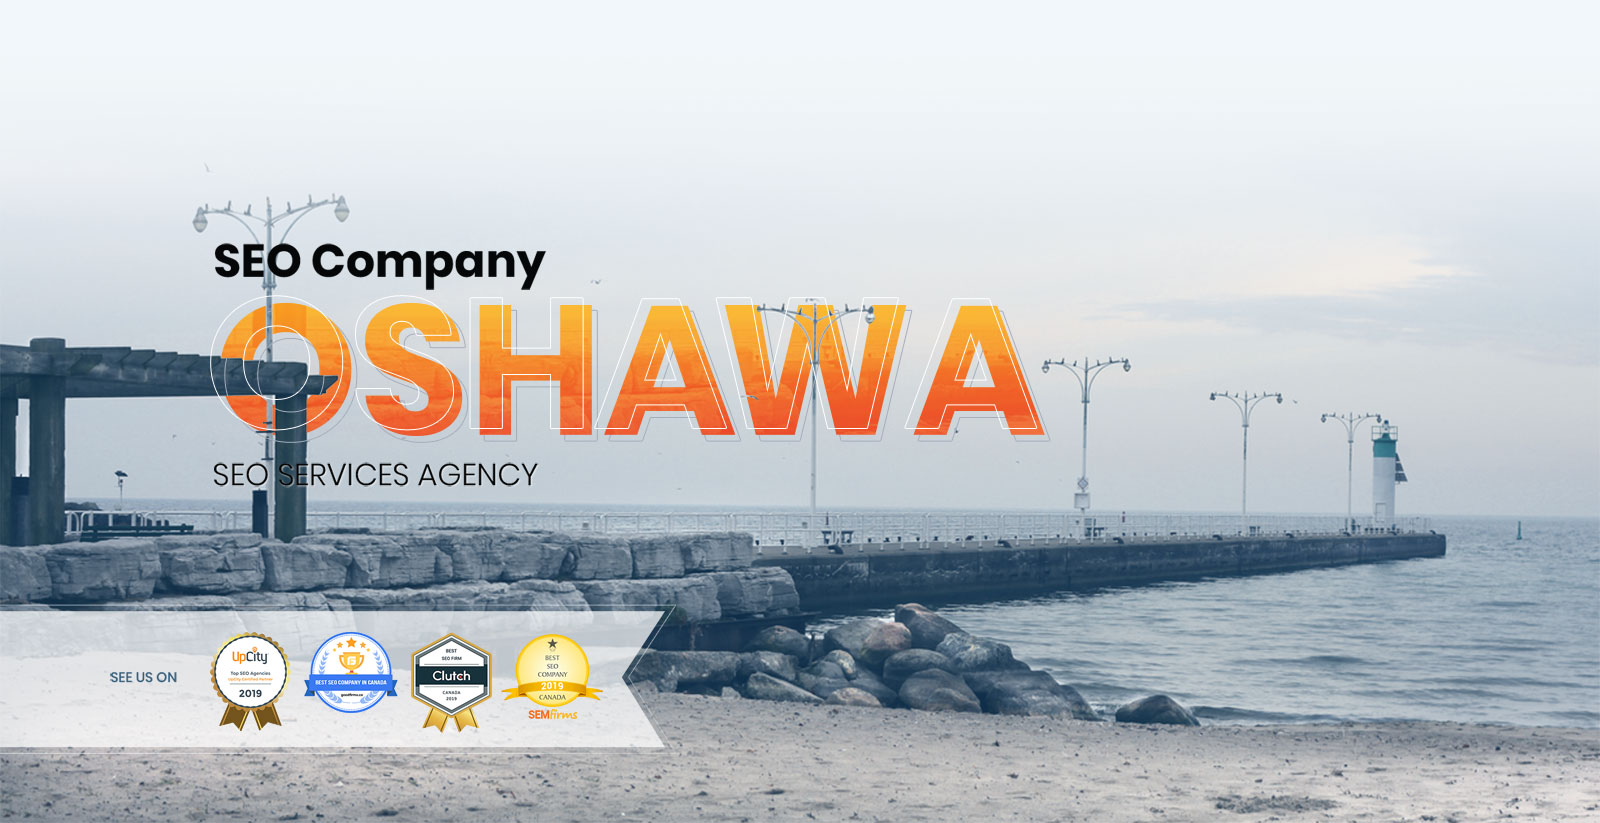 Best SEO Company Oshawa | Oshawa Search Marketing Agency